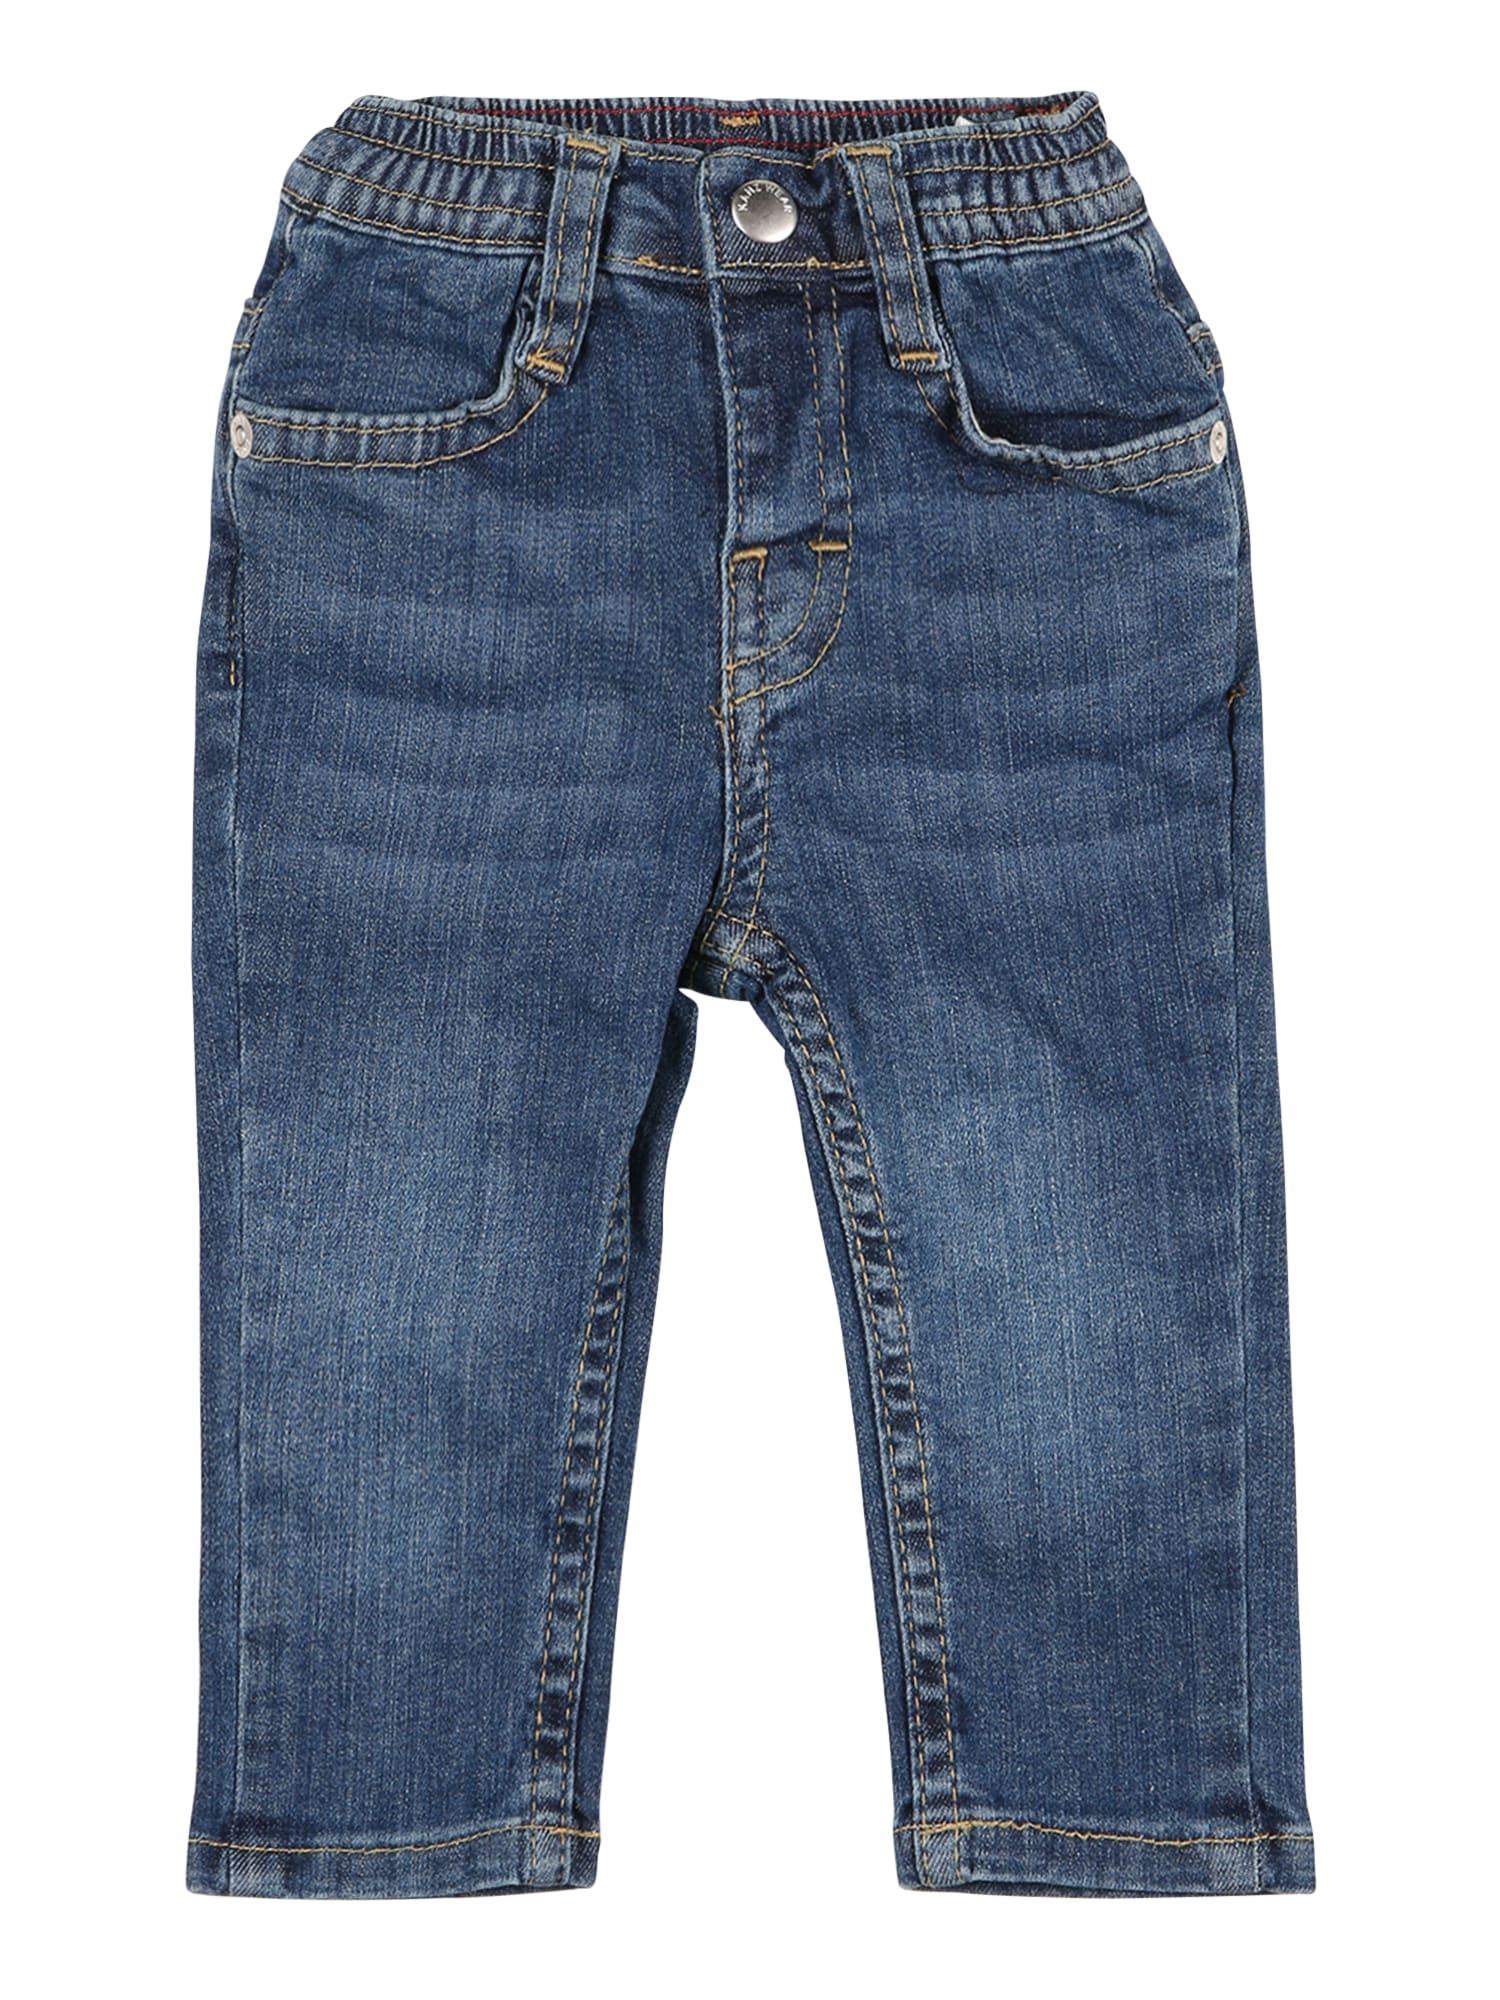 KANZ Džinsai tamsiai (džinso) mėlyna